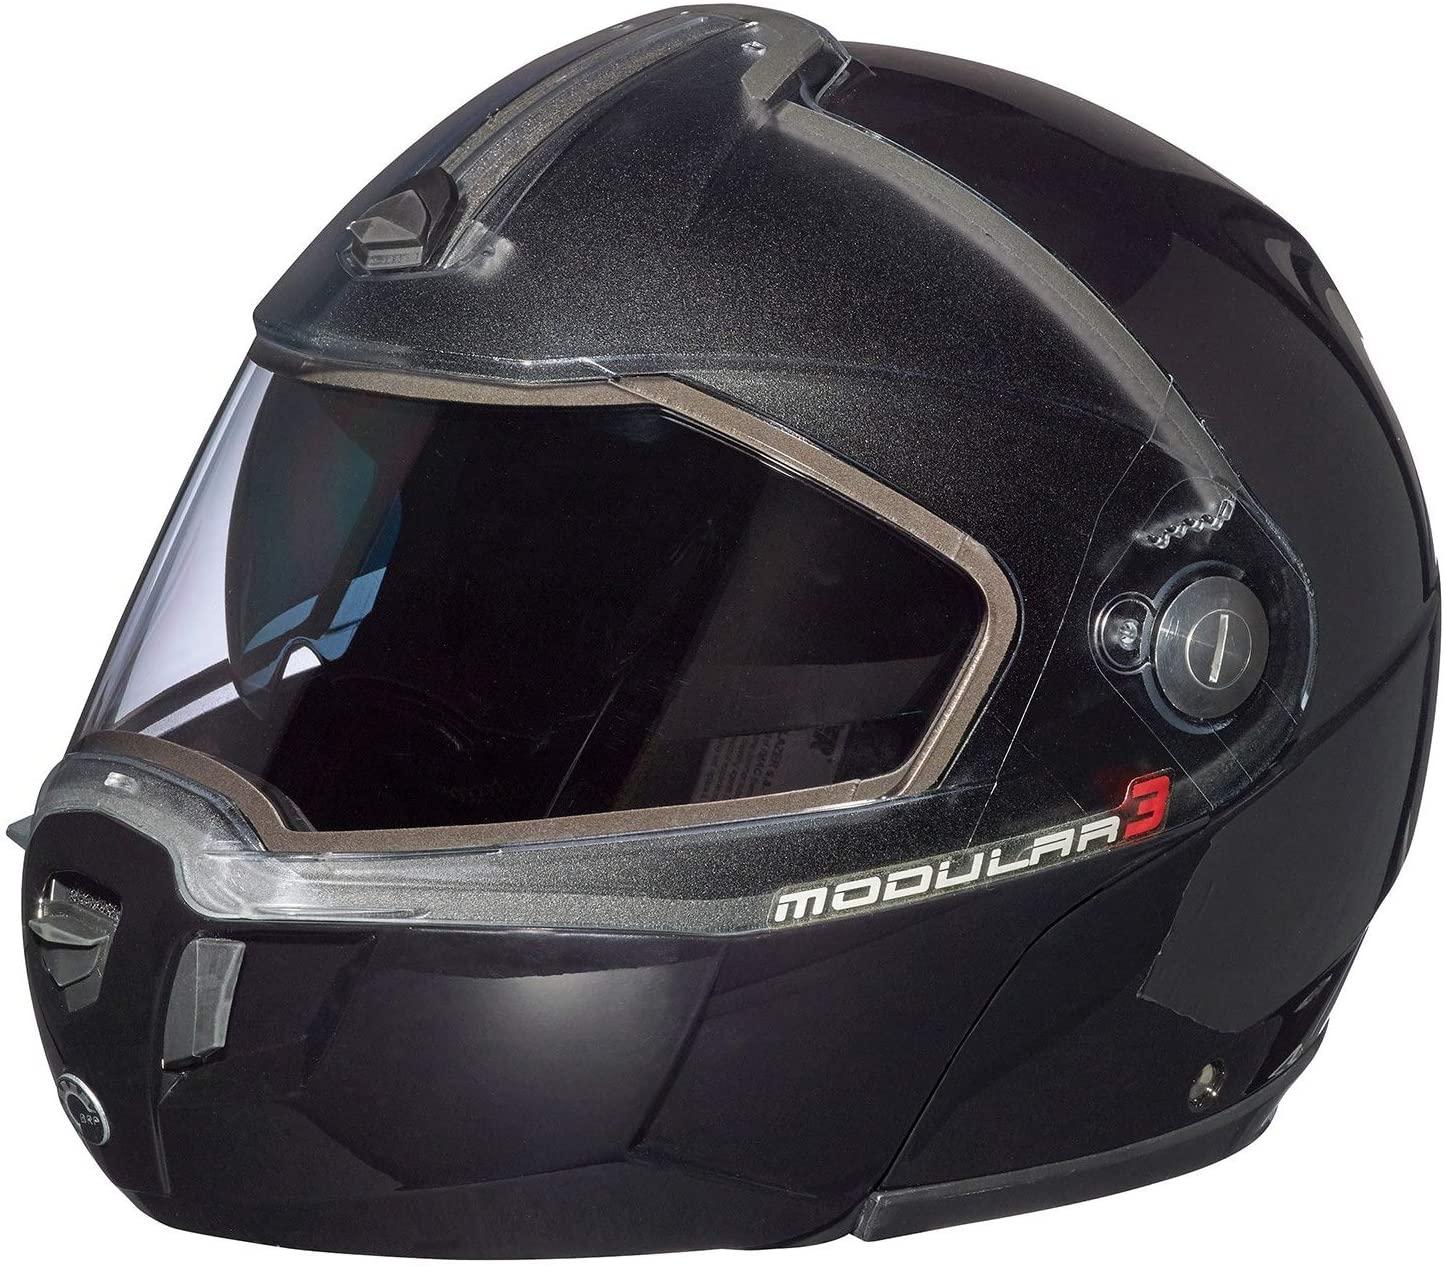 Ski-doo Modular 3 Snowmobiling Helmet-Black is one of the best snowmobile helmets